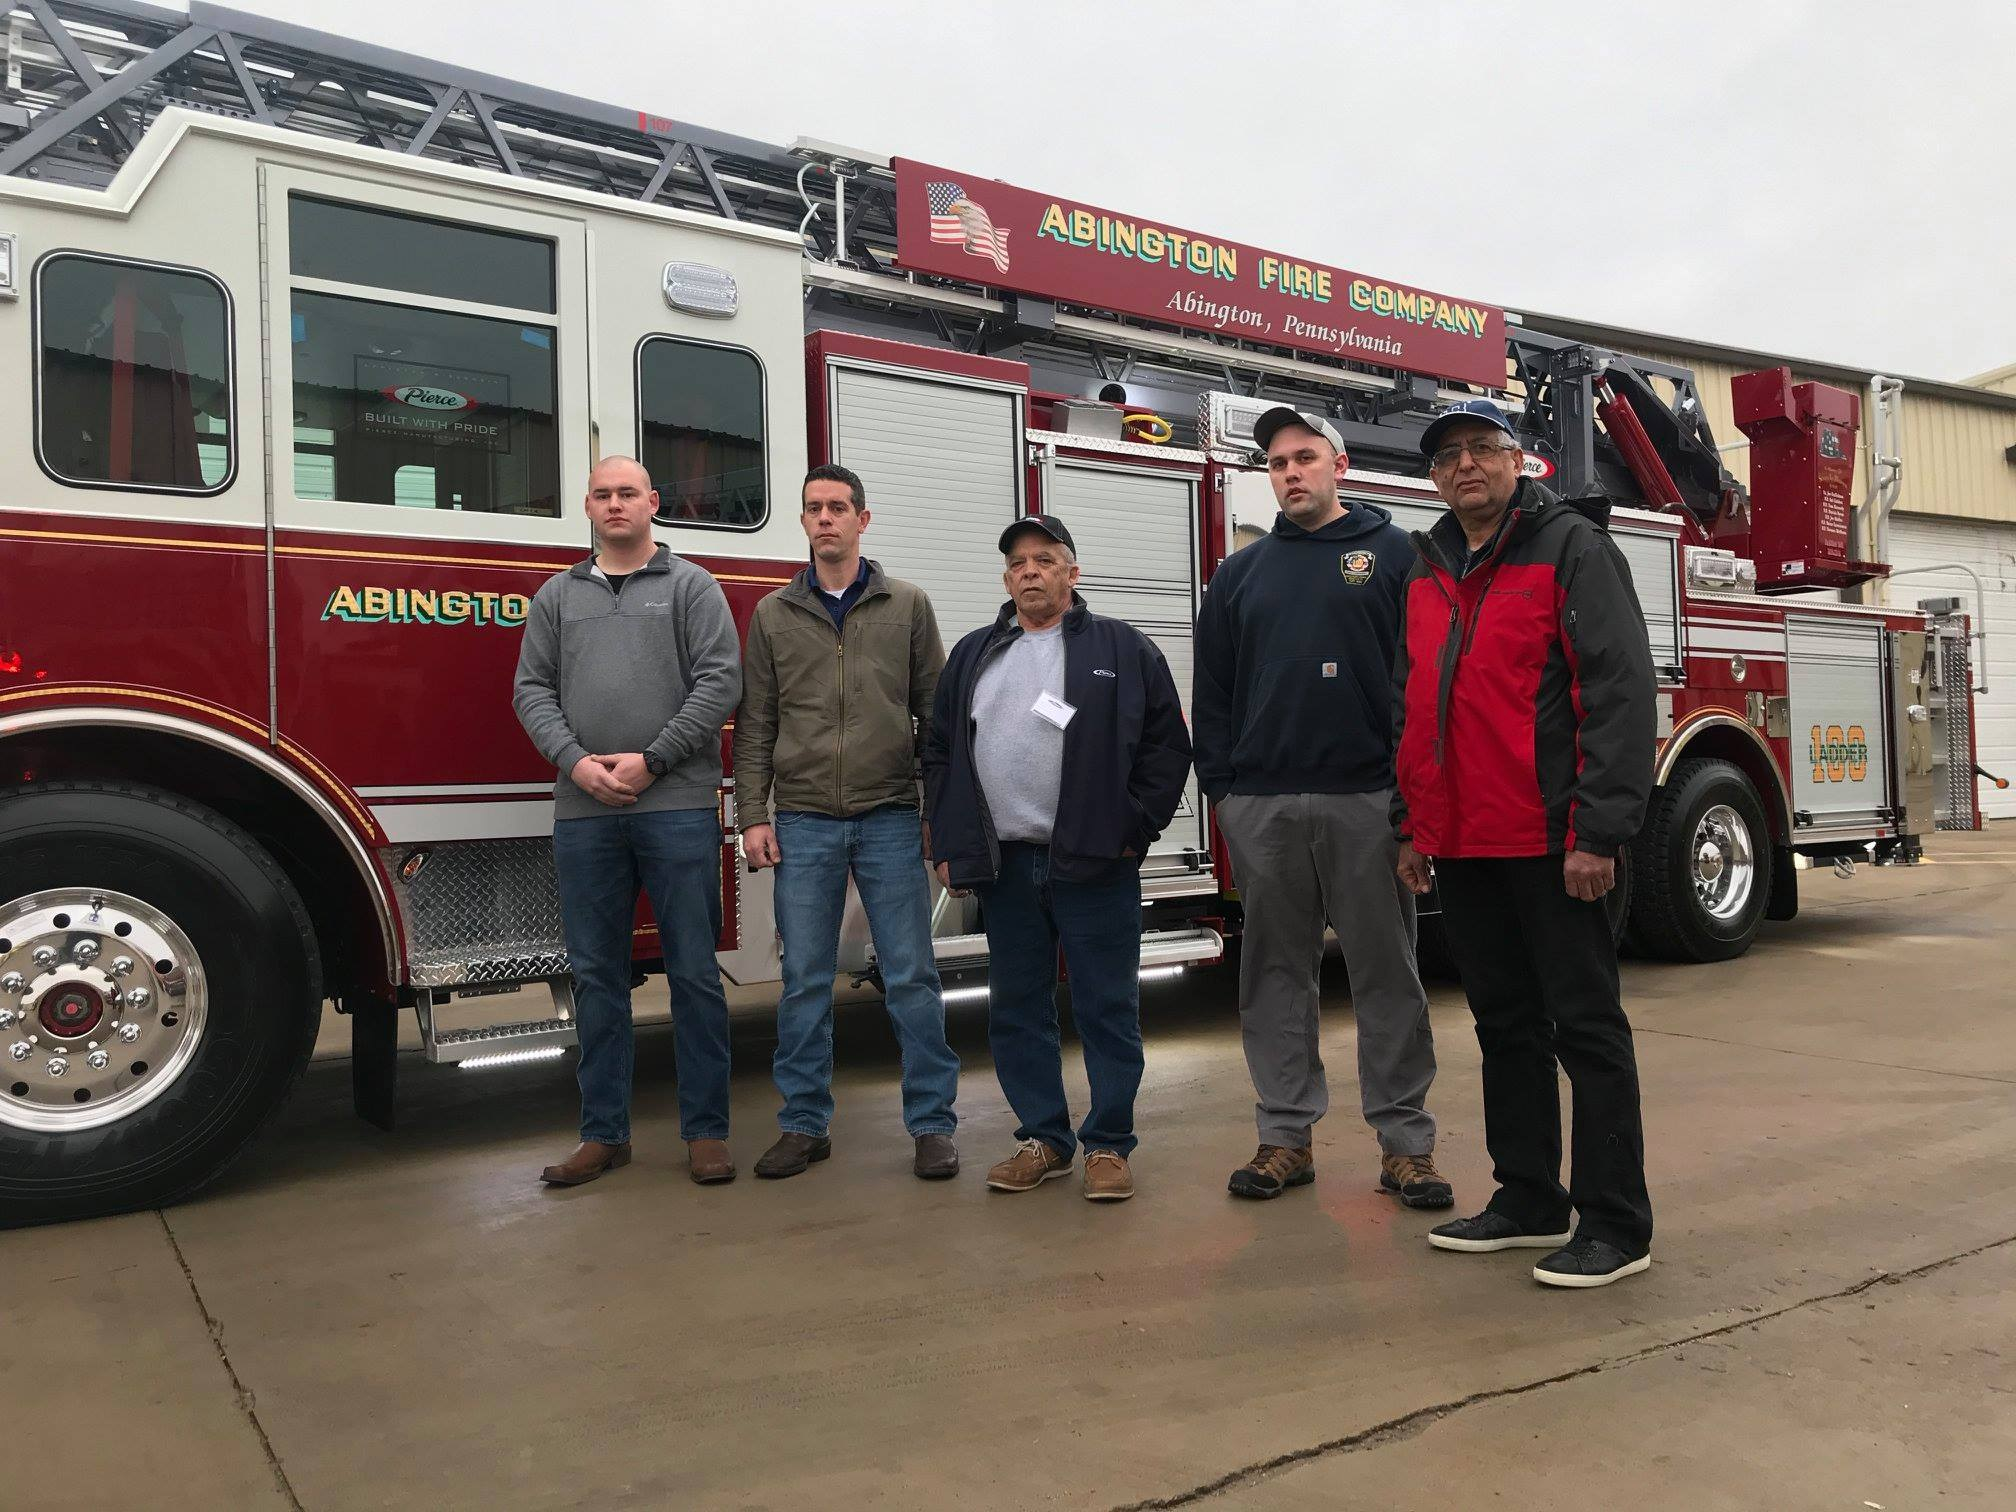 Abington Fire Company - Appleton.jpg